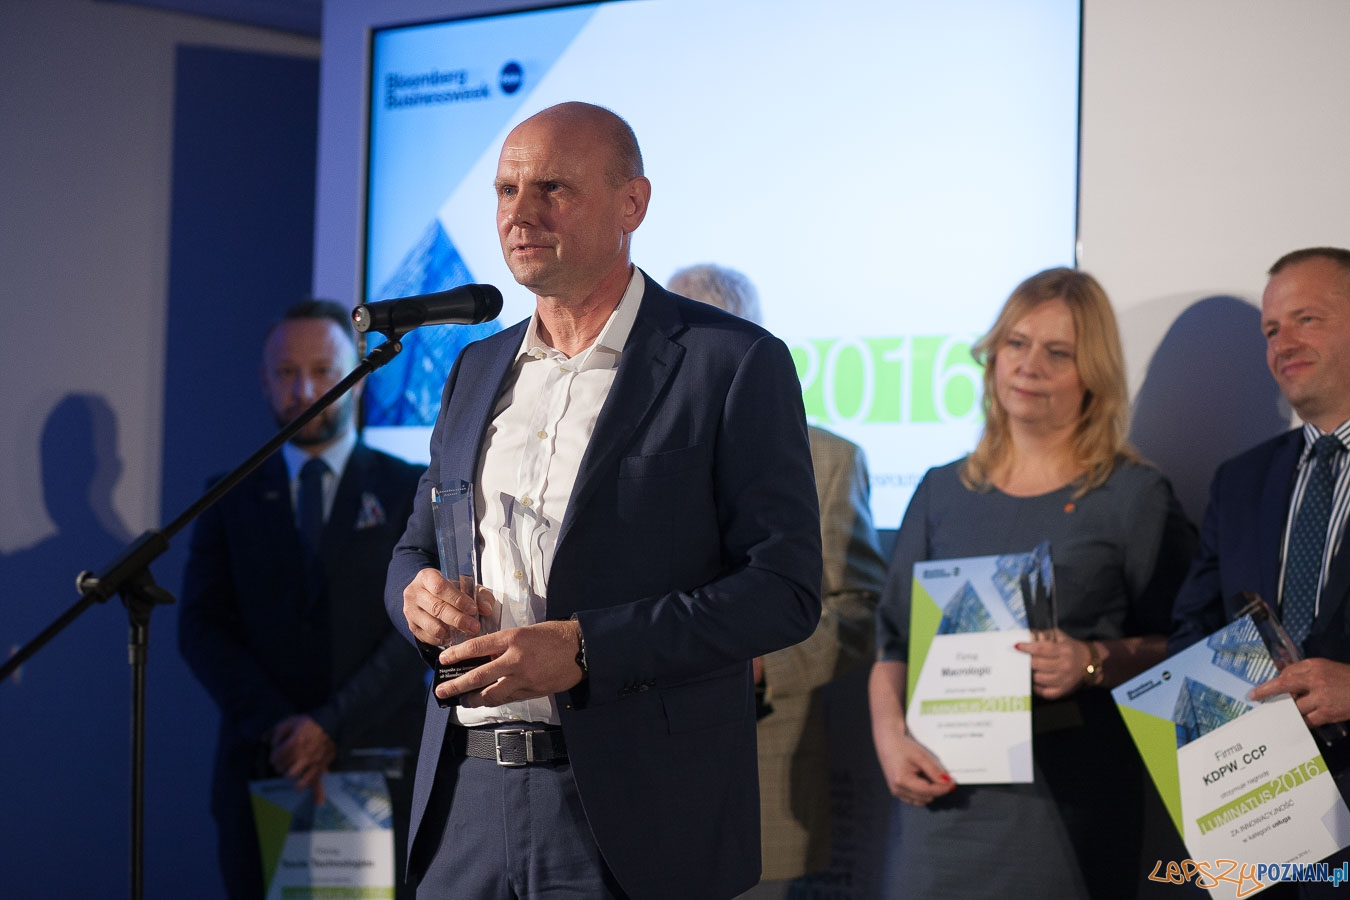 Spółka Schur Flexibles nagrodzona, Marek Pawlak  Foto: mat. prasowe